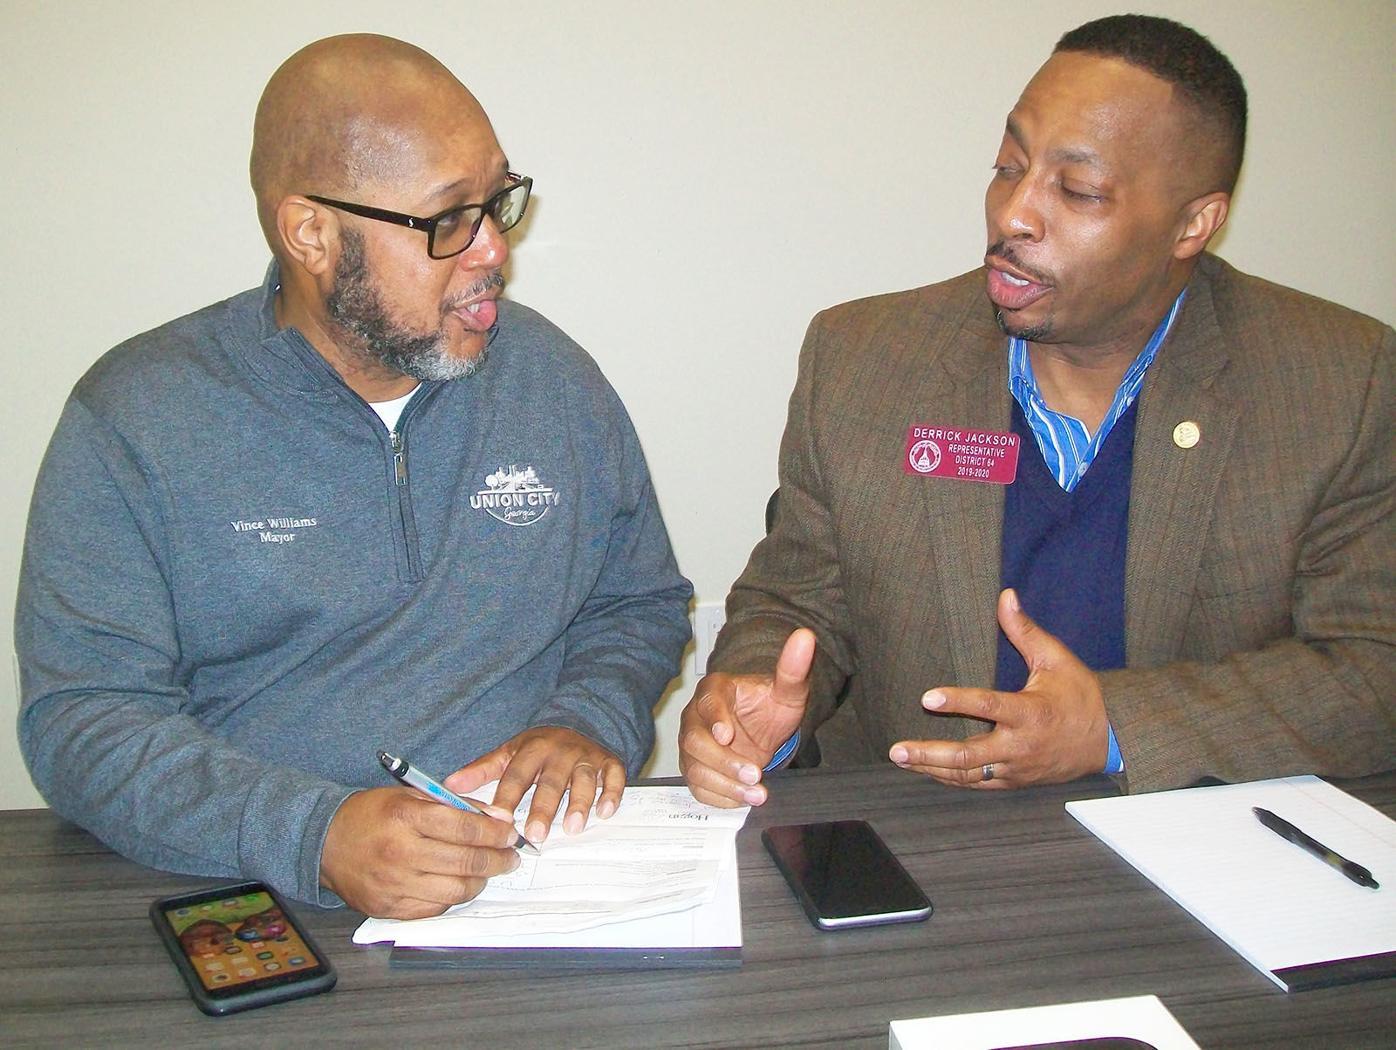 013019_SFN_UC_community_center_002 Vince Williams Derrick Jackson